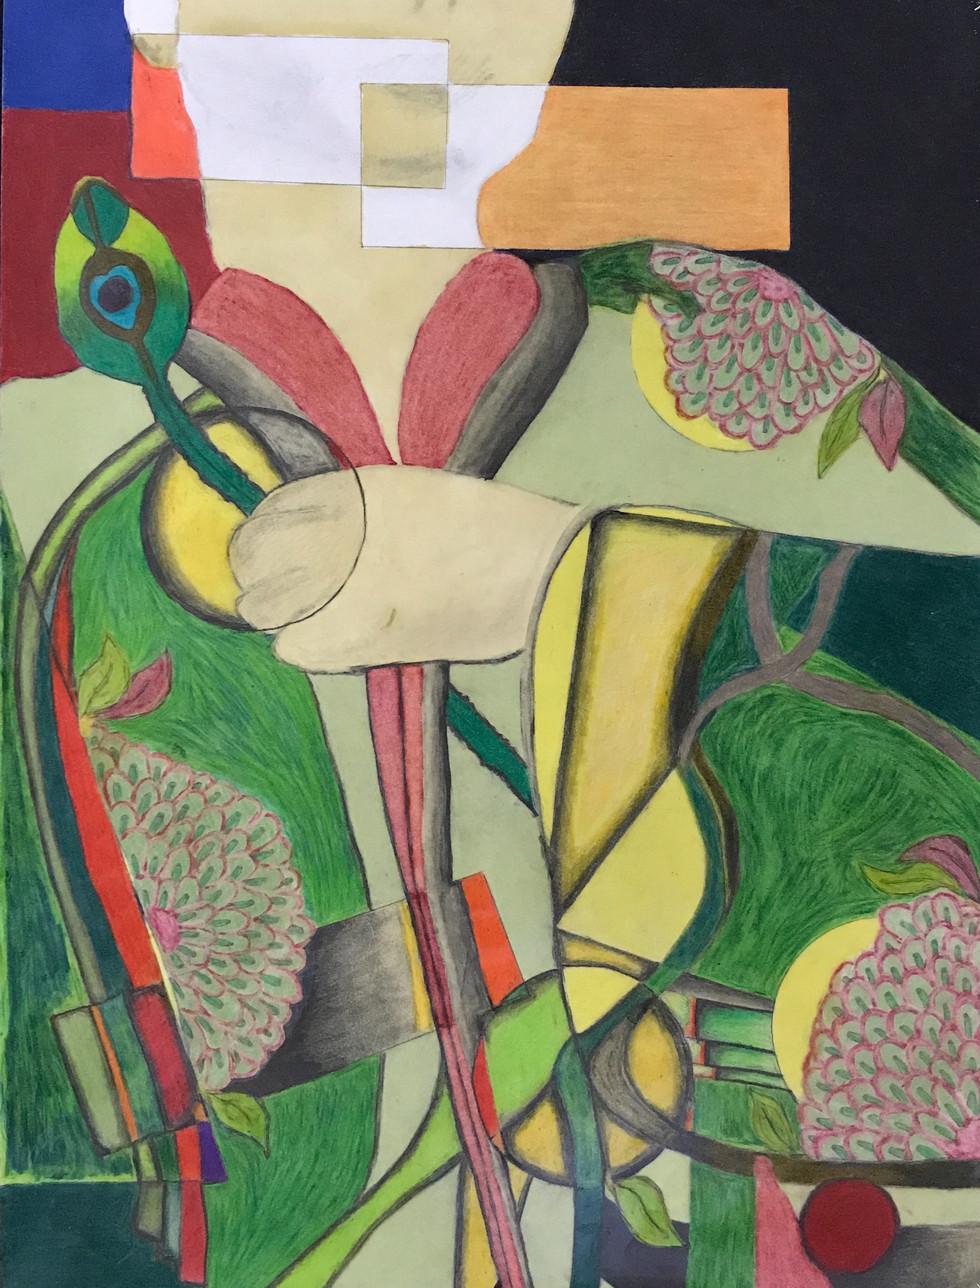 Demetri Fisher art - prolixis 6